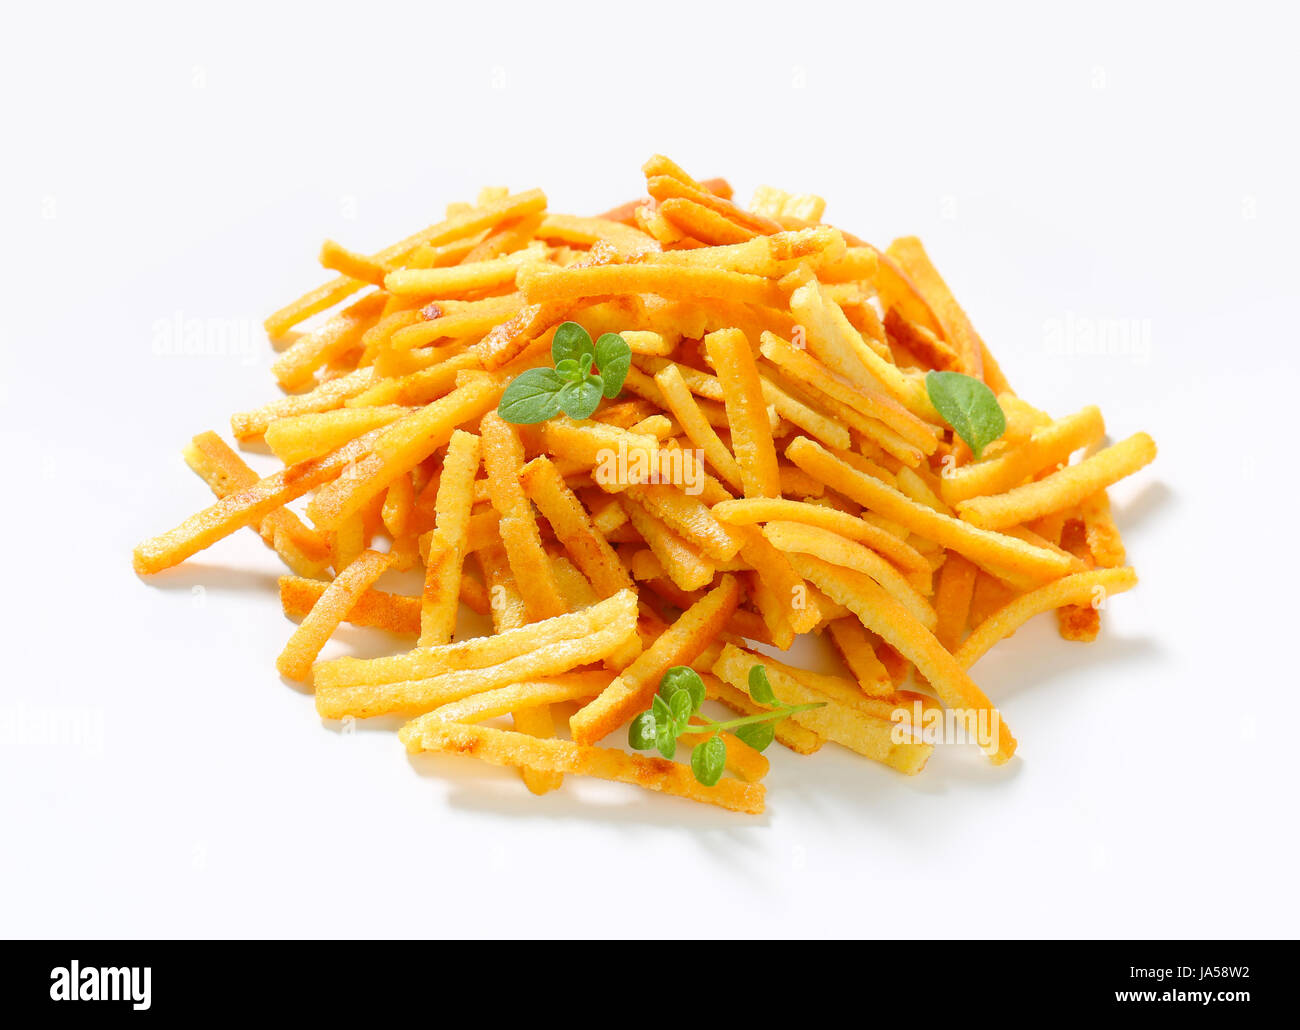 food, aliment, closeup, noodles, heap, sliced, omelet, fried, slim, arid, - Stock Image